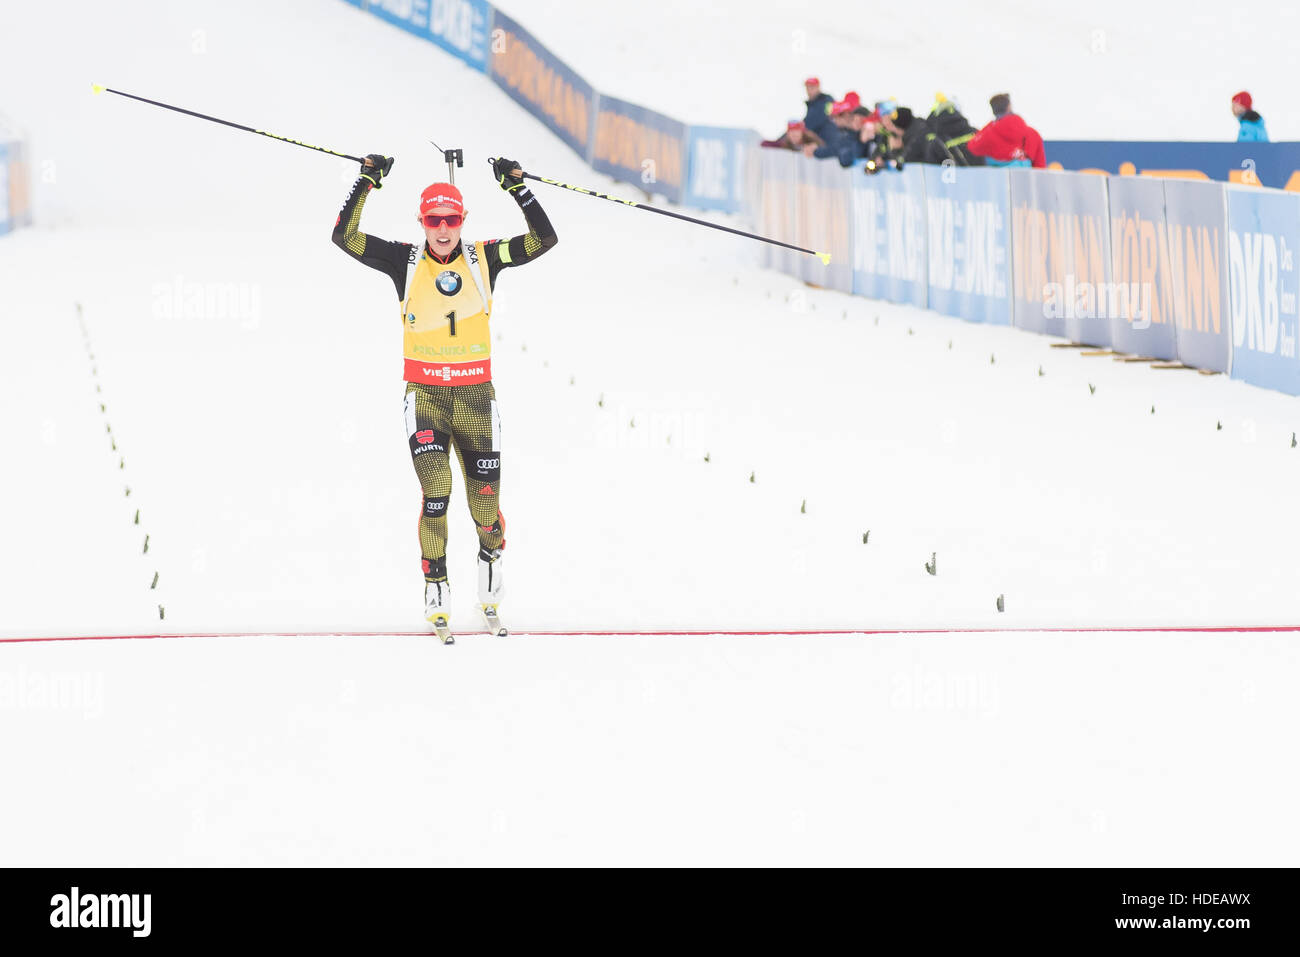 Pokljuka, Slowenien. 10. Dezember 2016. Laura Dahlmeier Deutschland Kreuzung Ziellinie während 10 km Verfolgung Stockbild